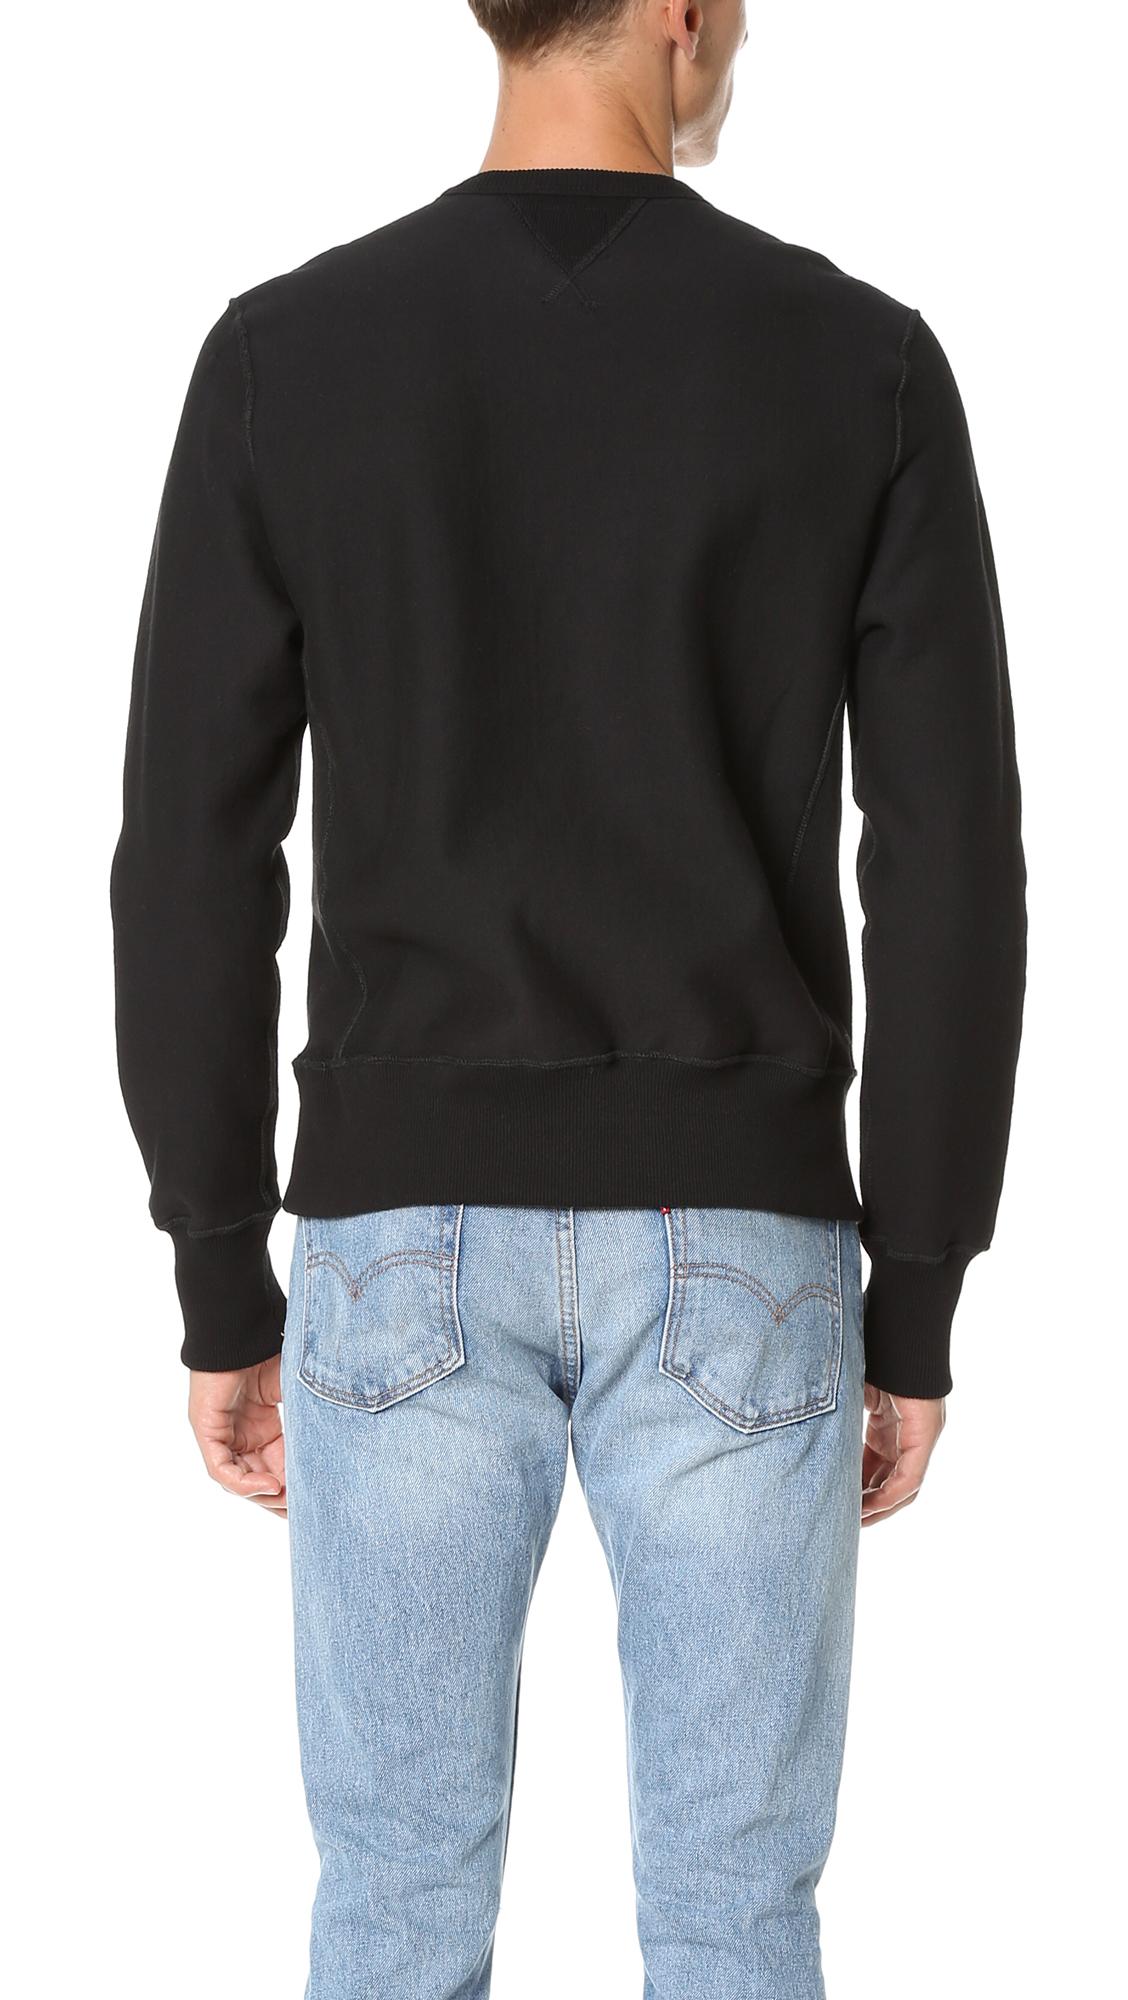 972049a39671 Todd Snyder + Champion Men's Reverse Weave Crewneck Sweatshirt $148 ...